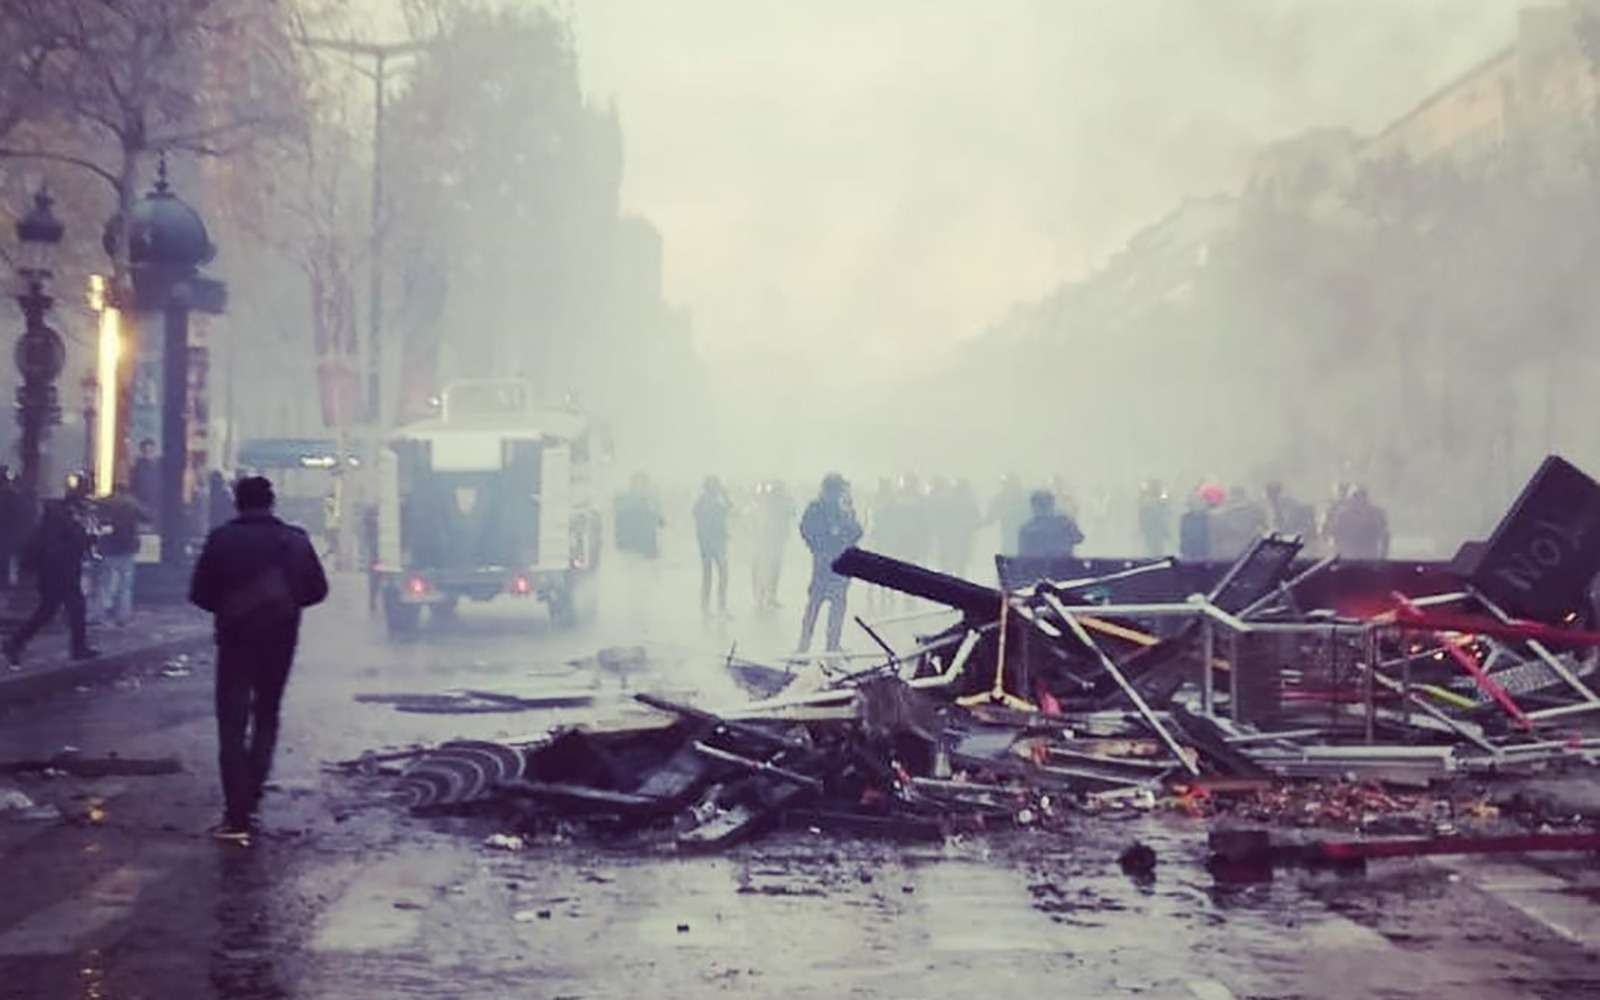 Какфранцузы протестуют против роста цен натопливо: баррикады против водометов— фото 926167